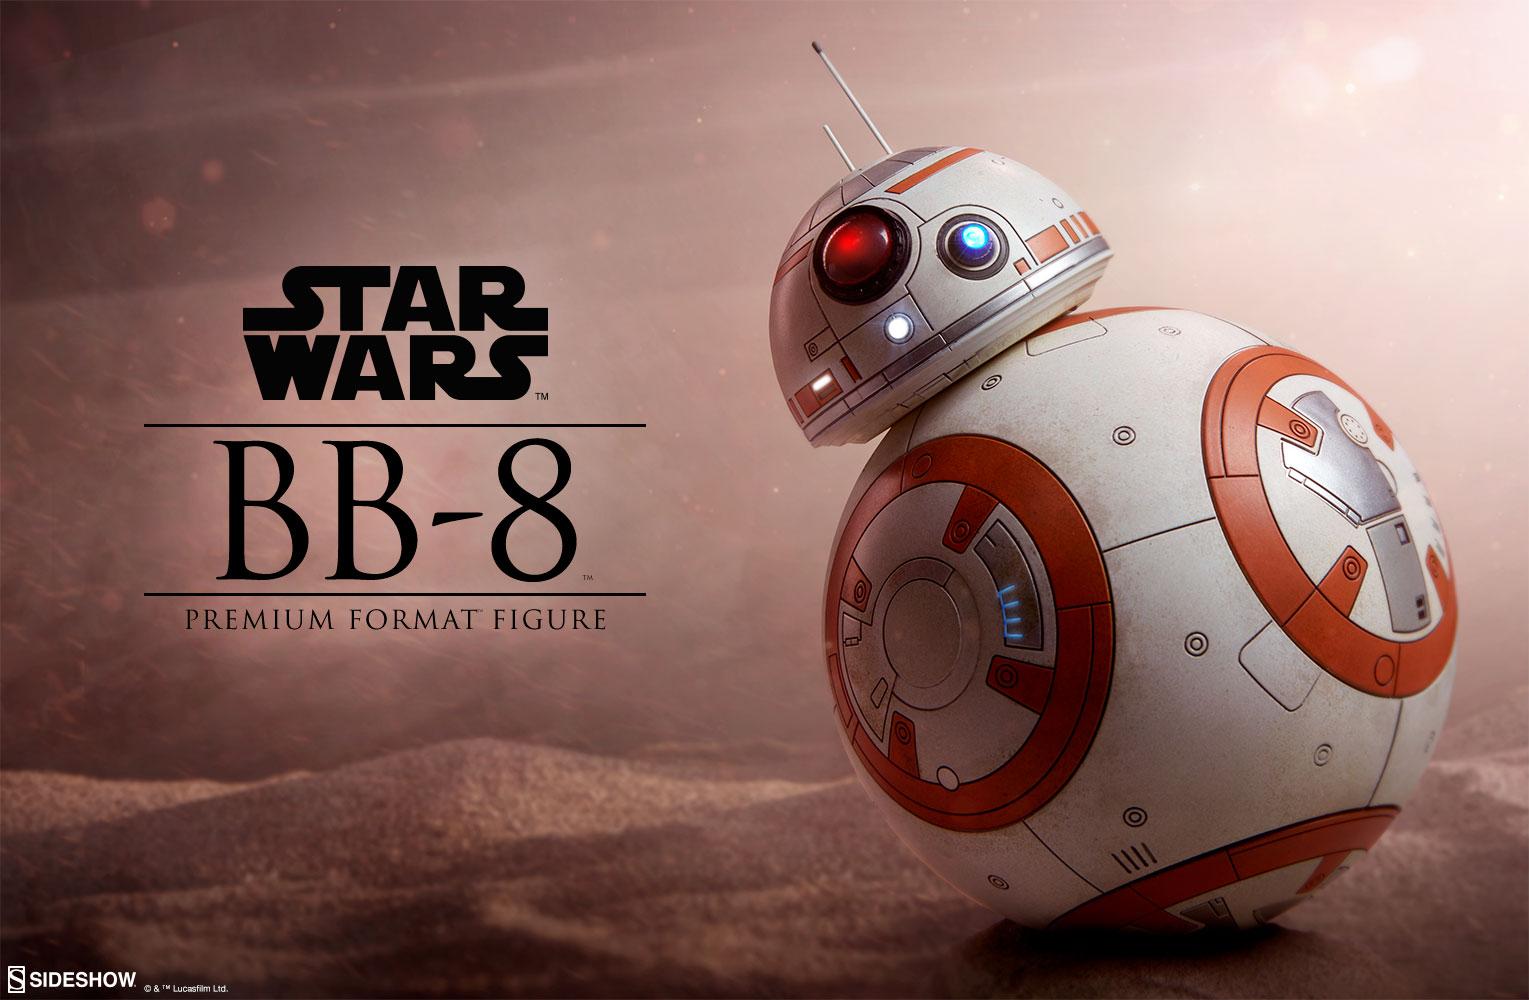 star wars bb 8 premium format tm figure by sideshow. Black Bedroom Furniture Sets. Home Design Ideas